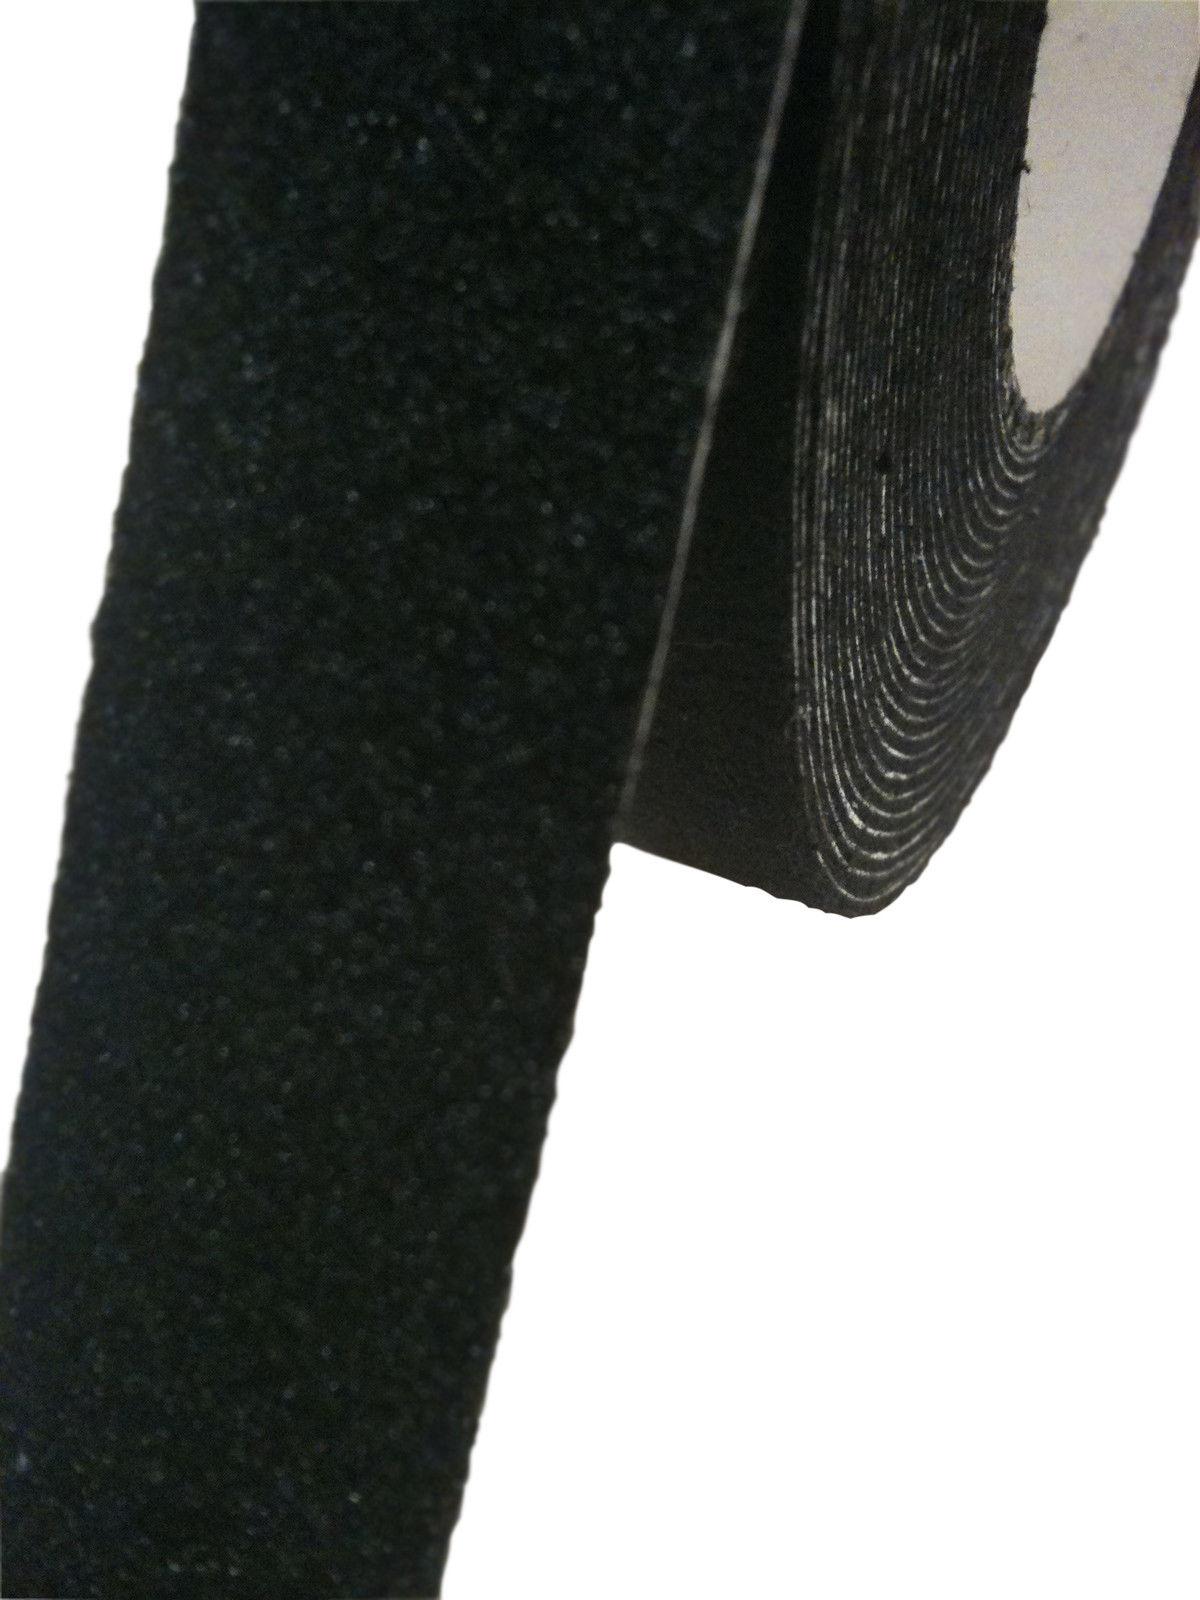 Anti-Squeak-Anti-Rattle-Self-Adhesive-Felt-Tape-Various-Sizes